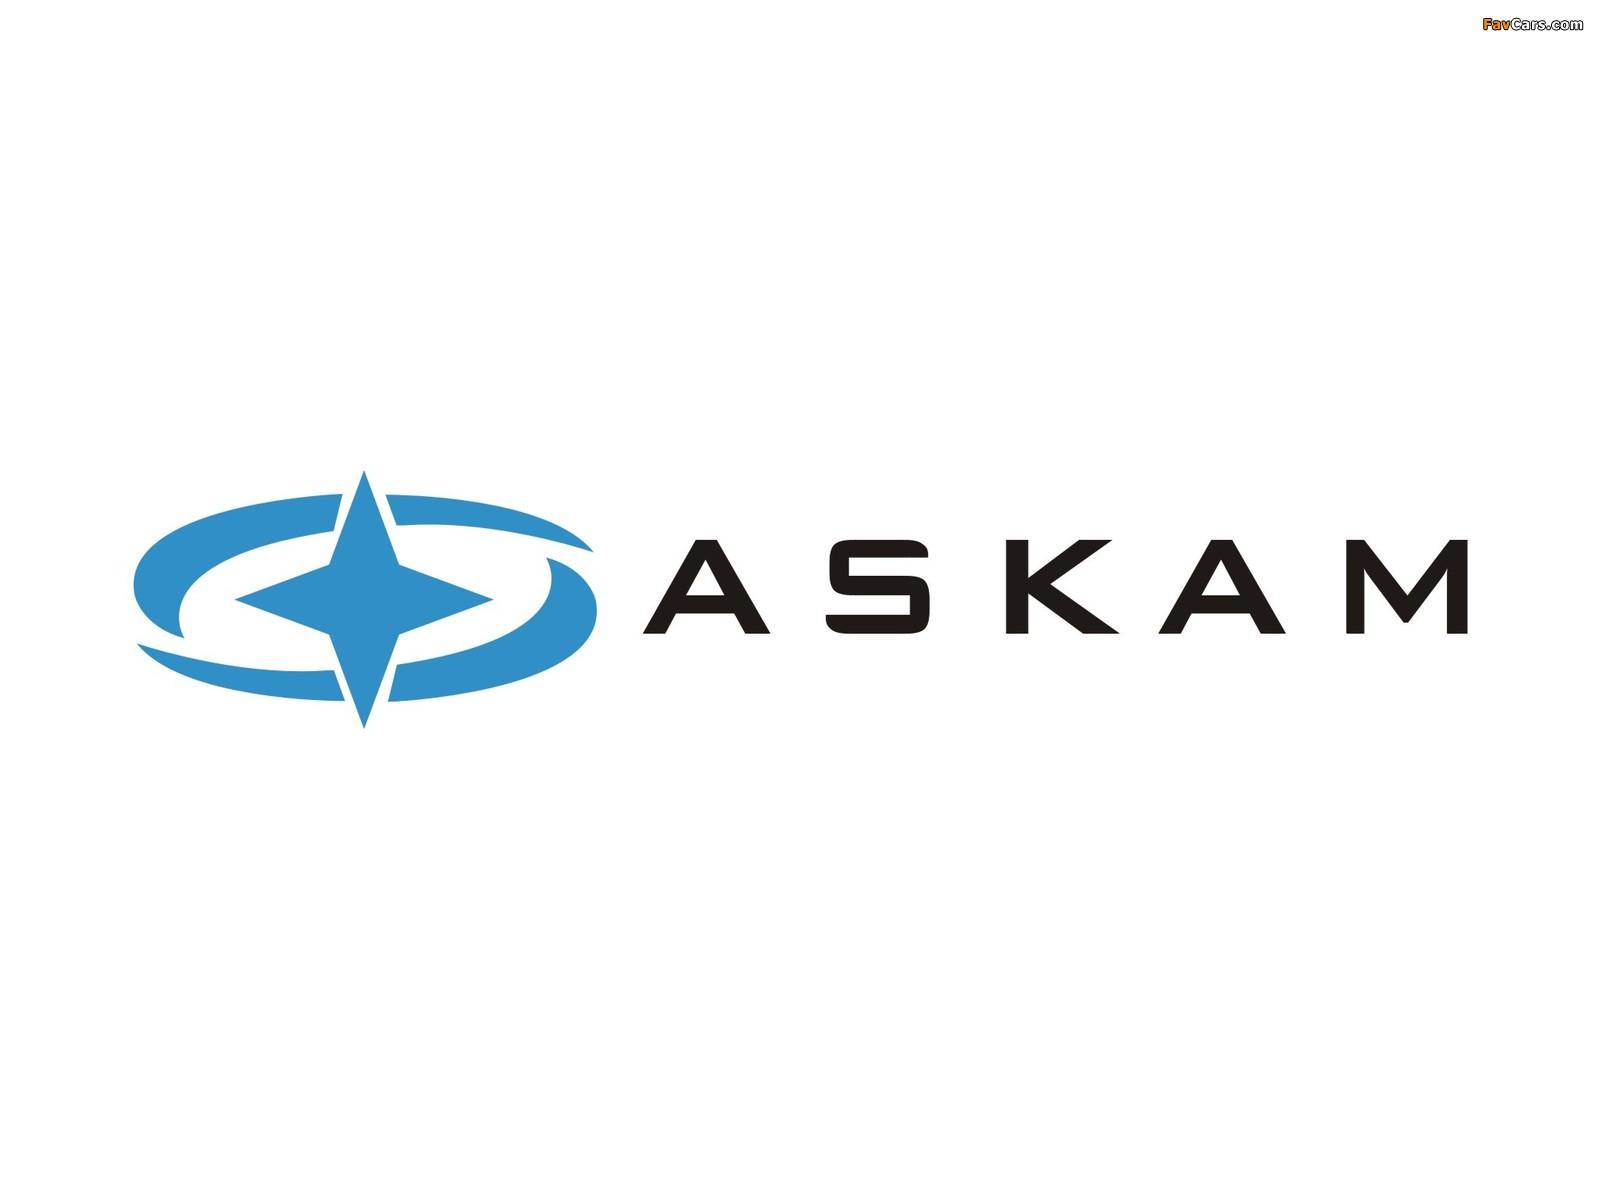 Photos of Askam (1600 x 1200)